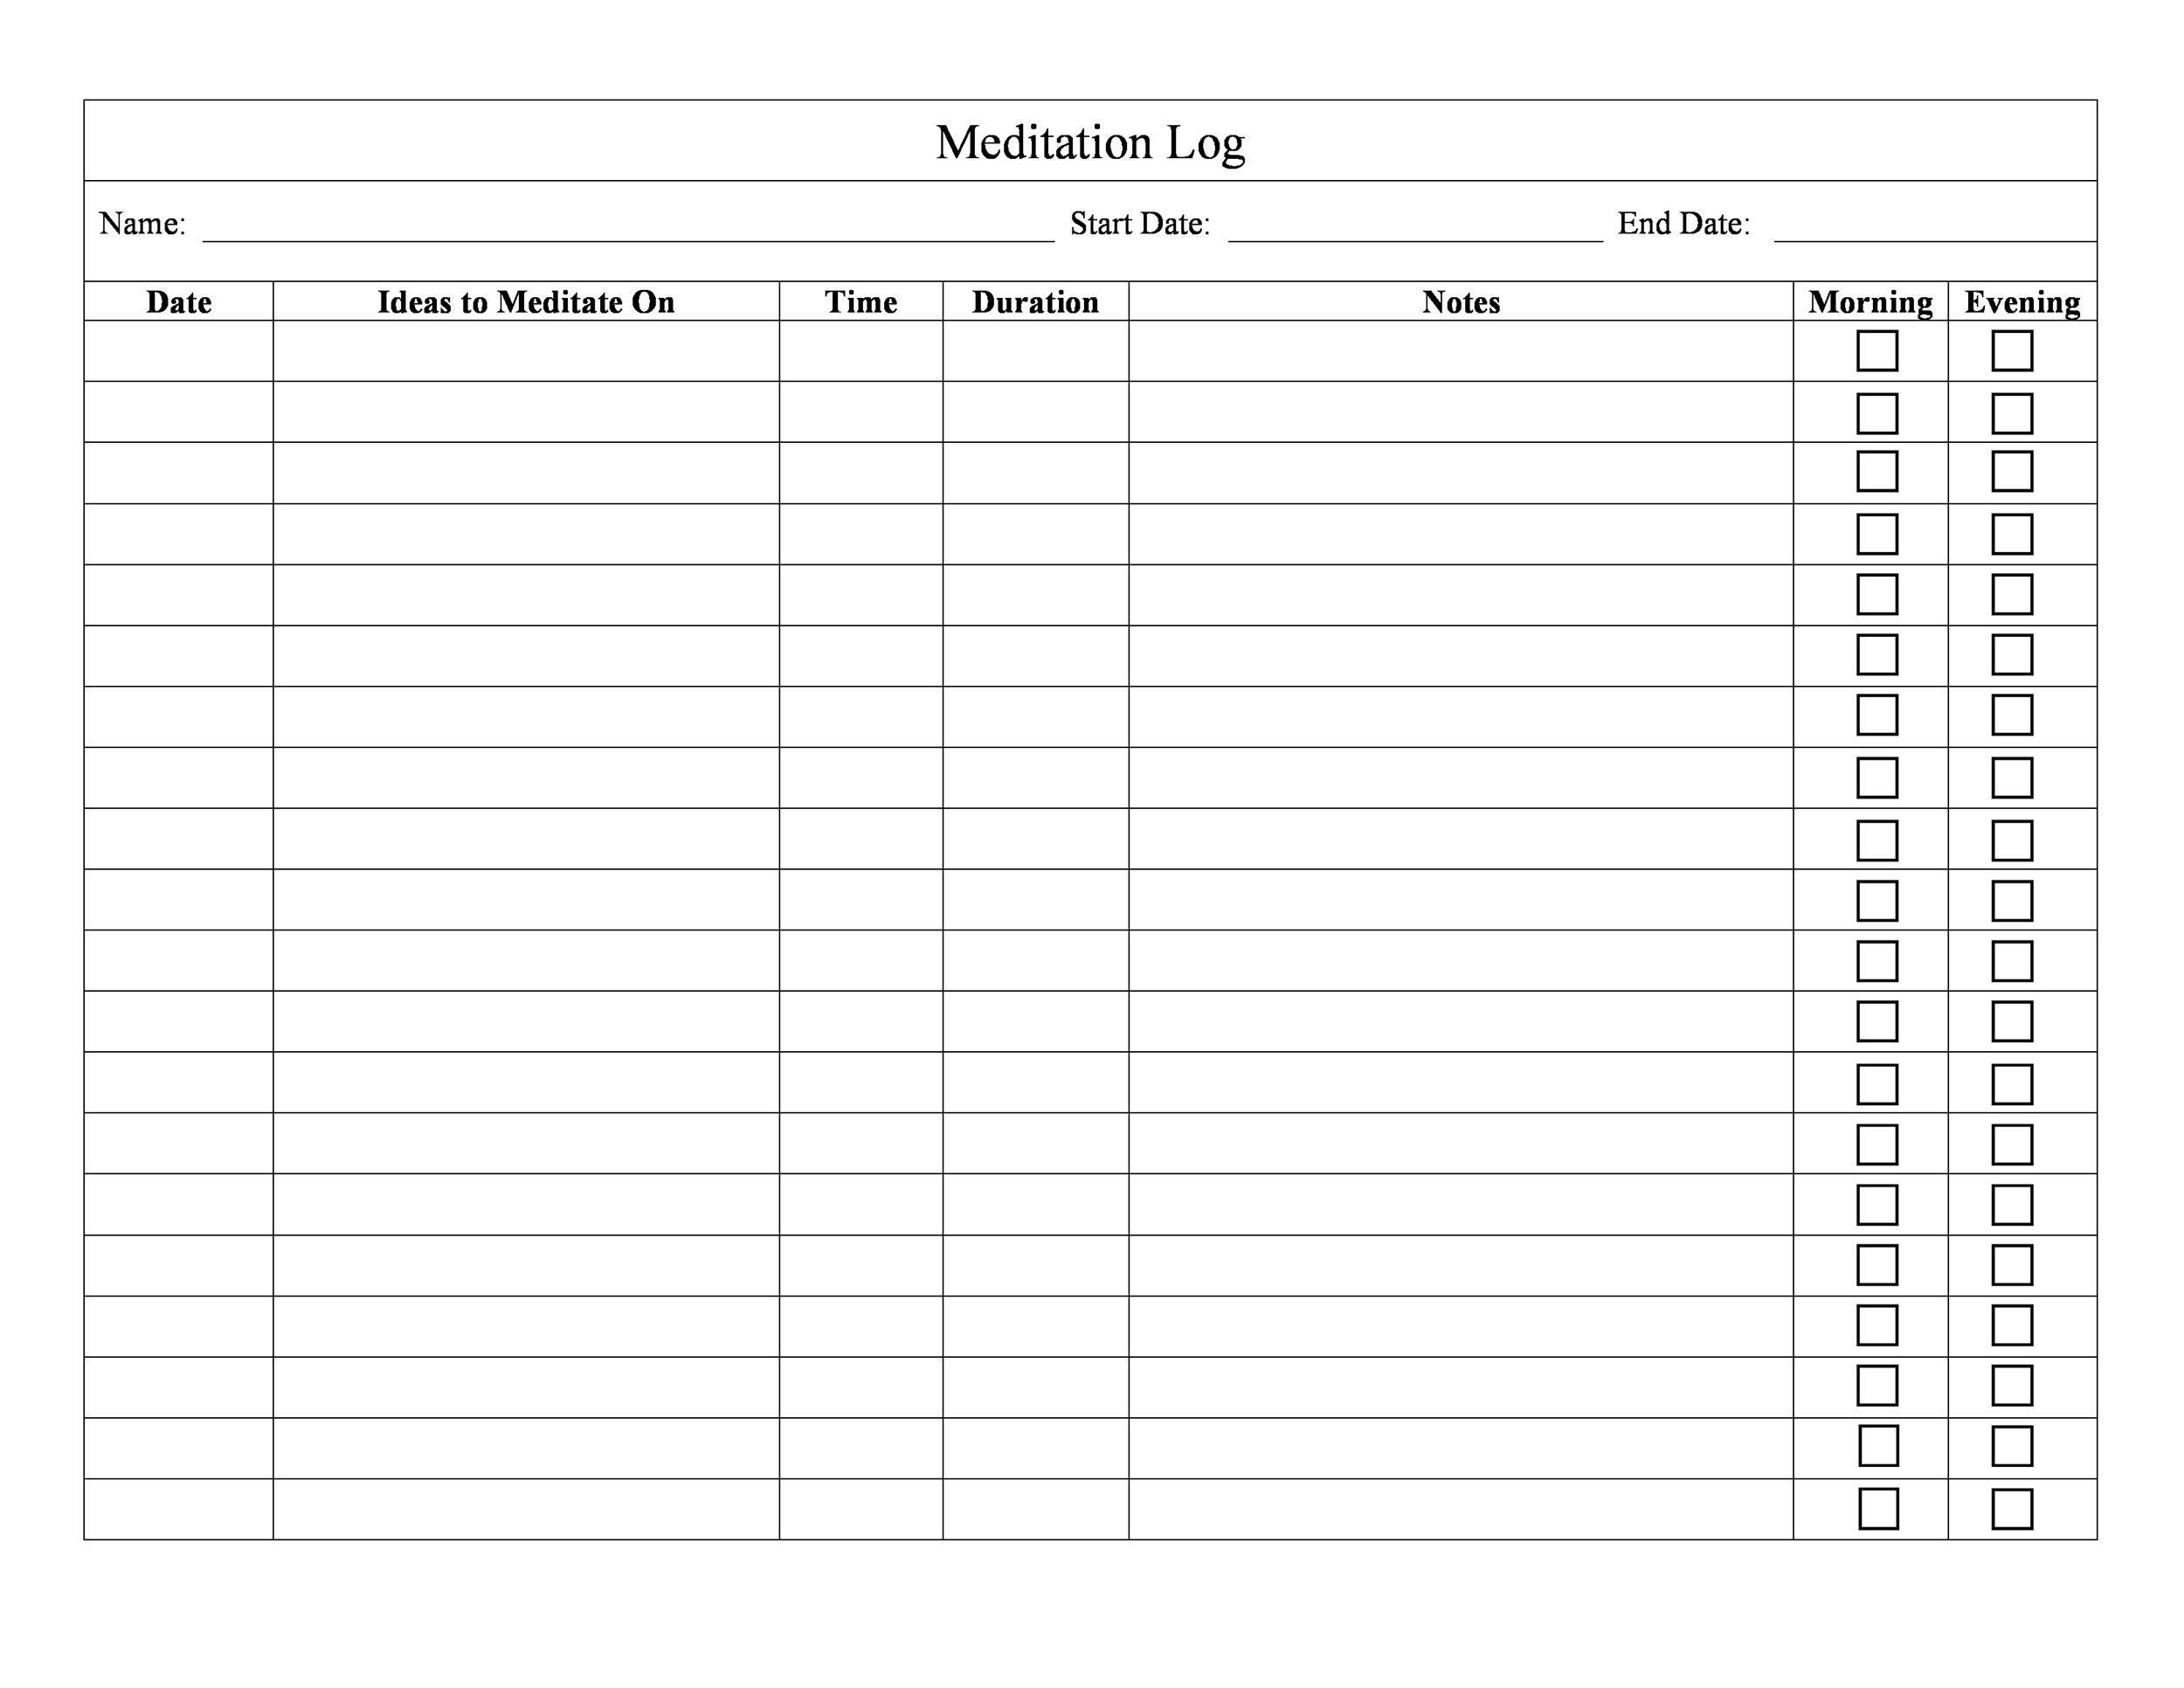 Universal 28 Day Calendar For Medication | Get Your Calendar Printable